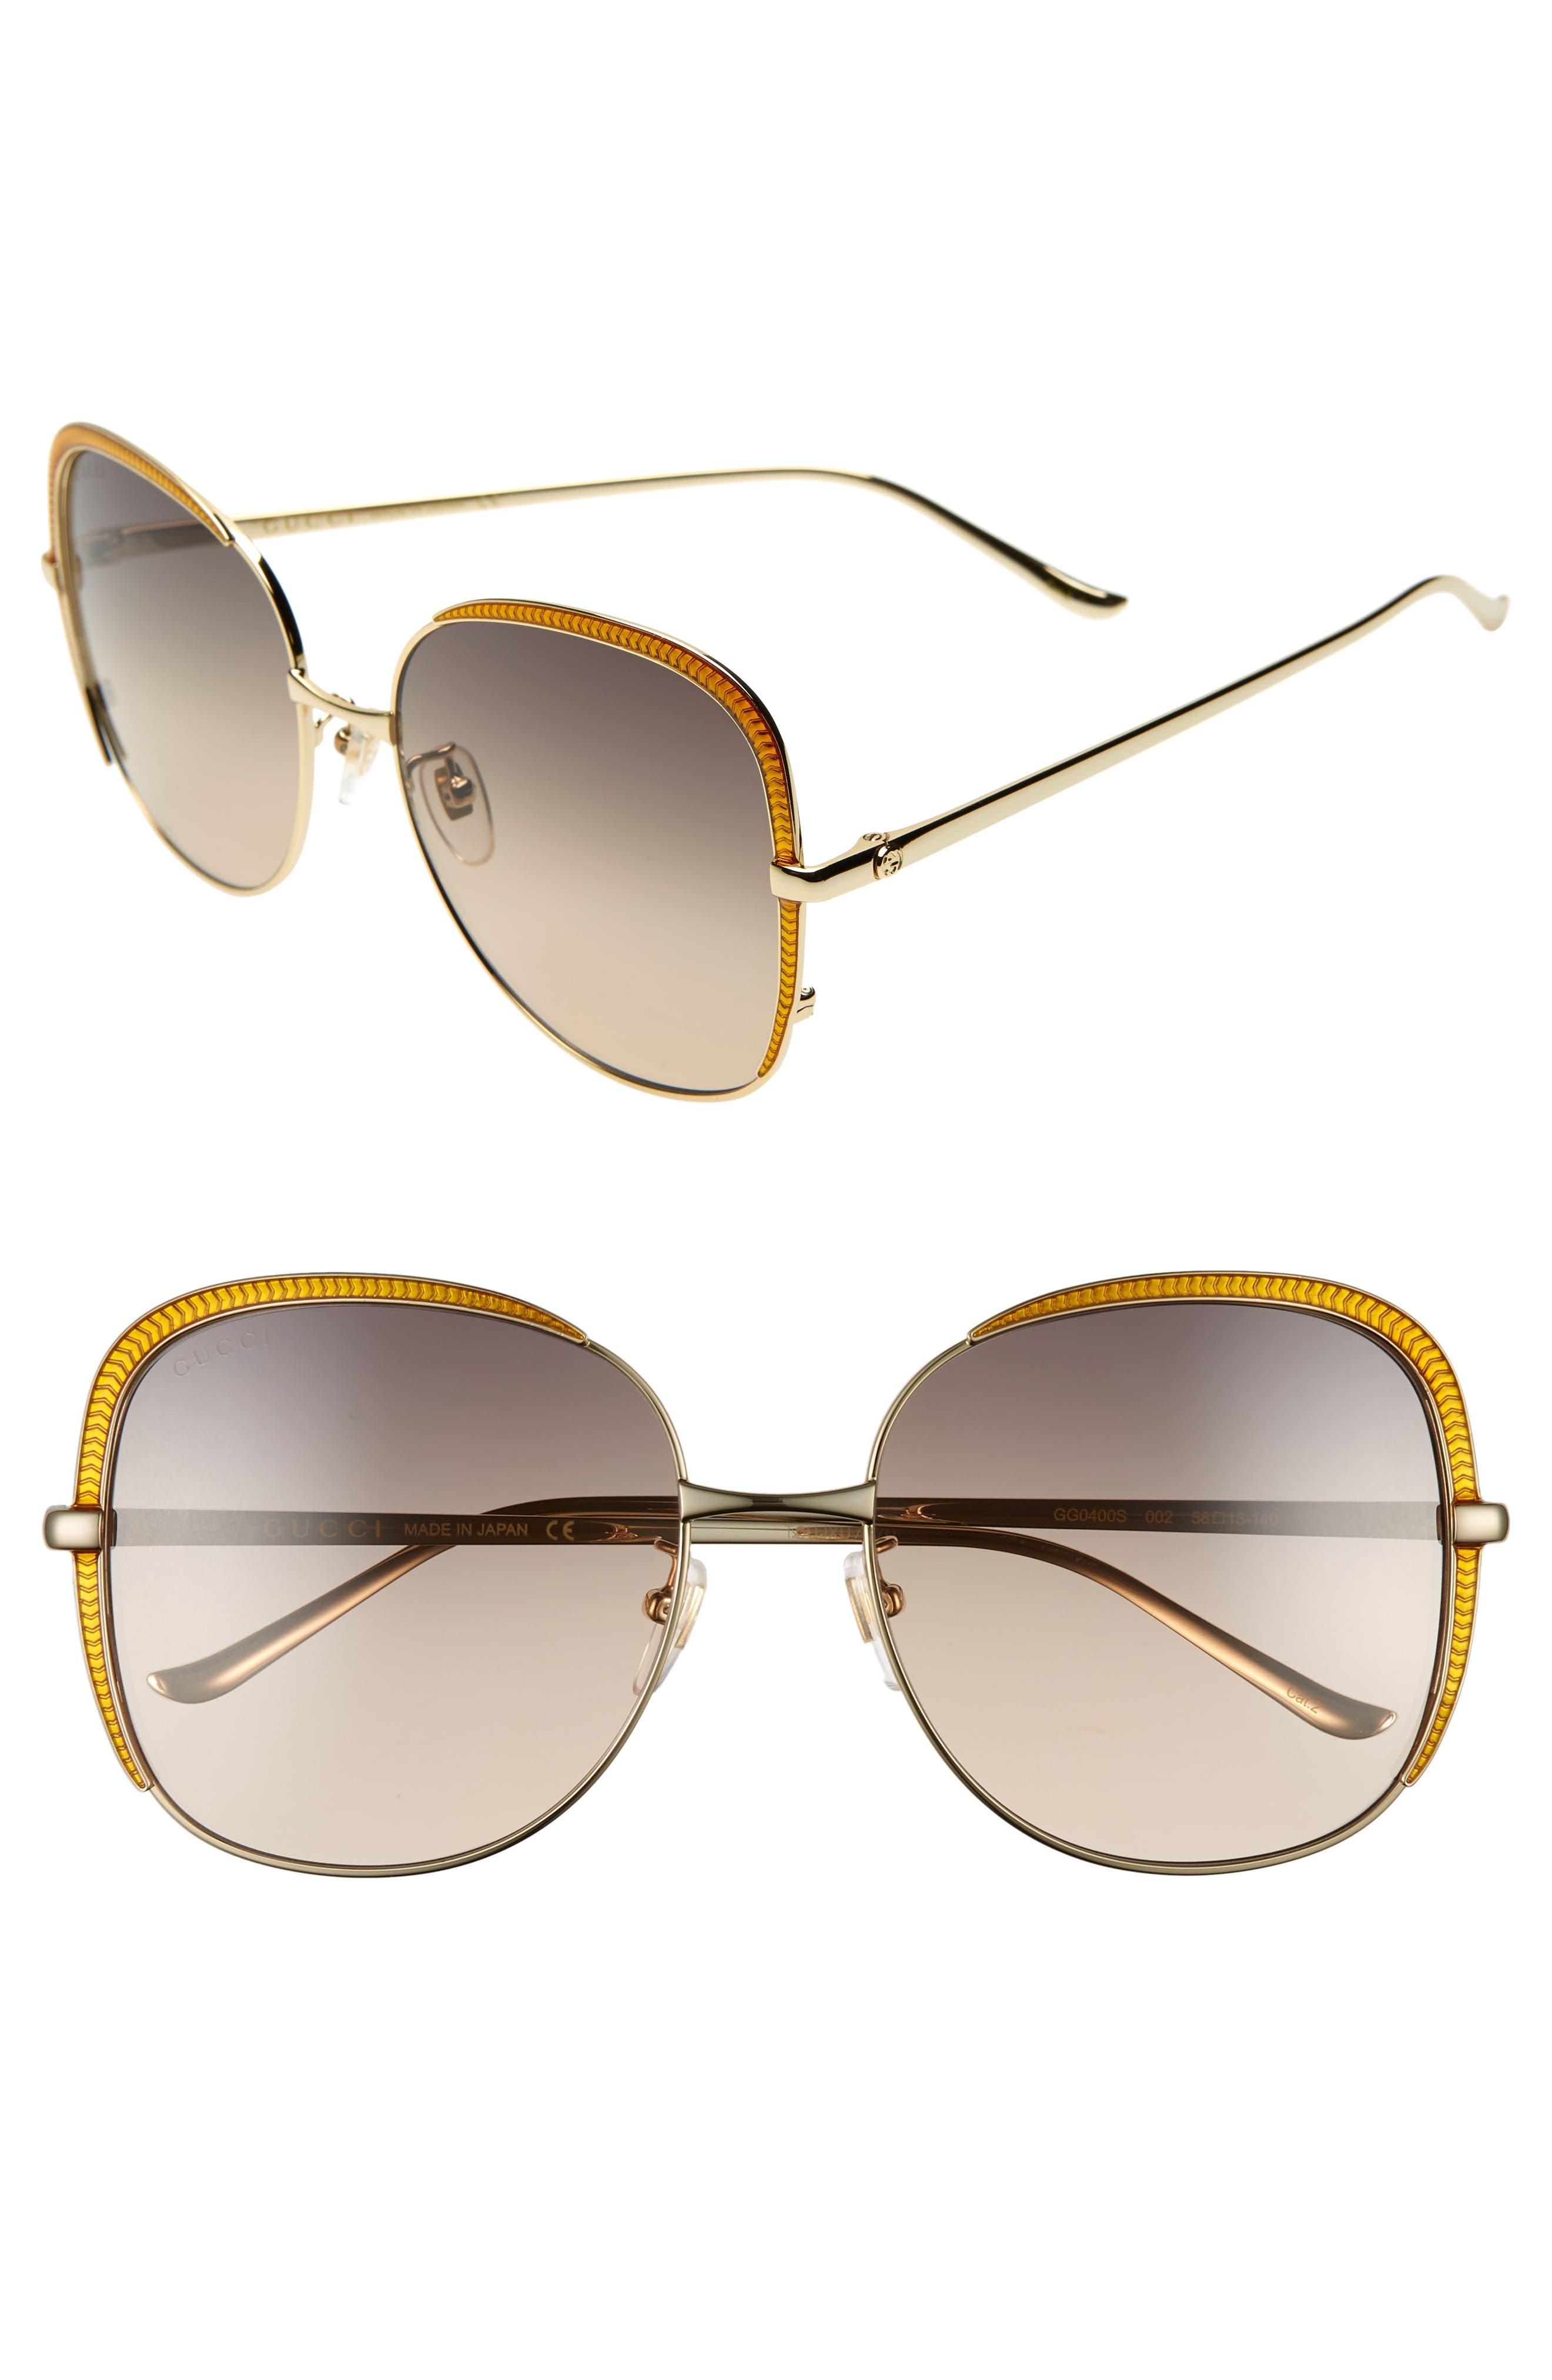 58mm Gradient Sunglasses, Main, color, GOLD/ PINK/ GREY GRADIENT